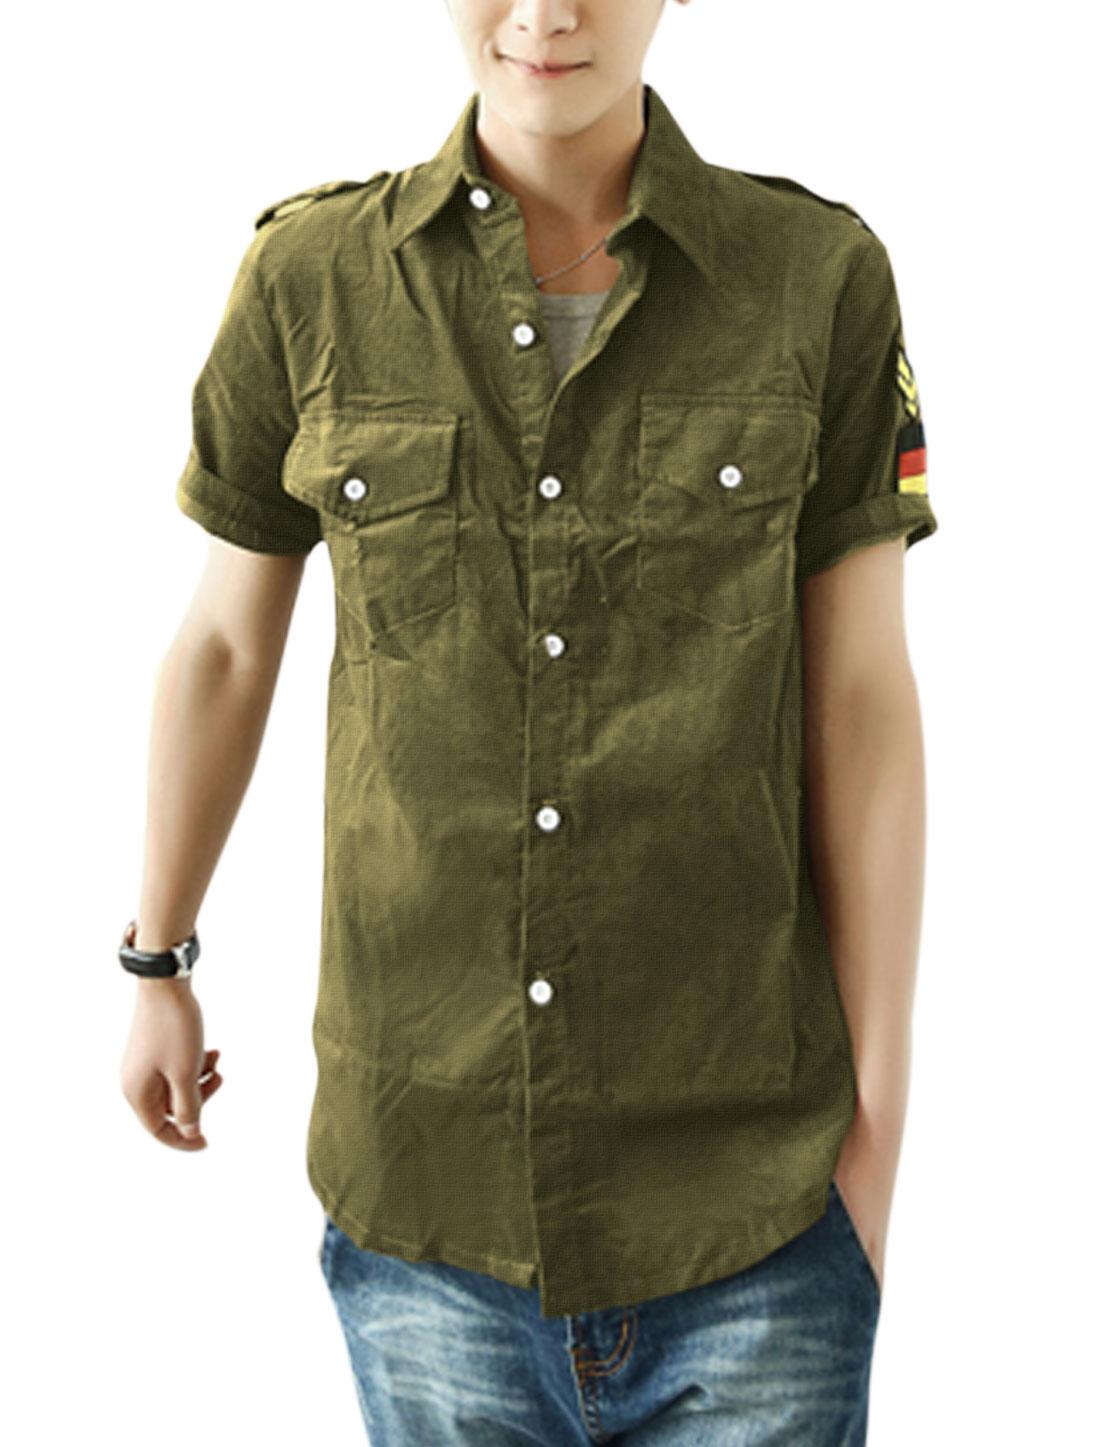 Men Point Collar Button-Front Epaulette Decor Shirt Dark Olive Green M